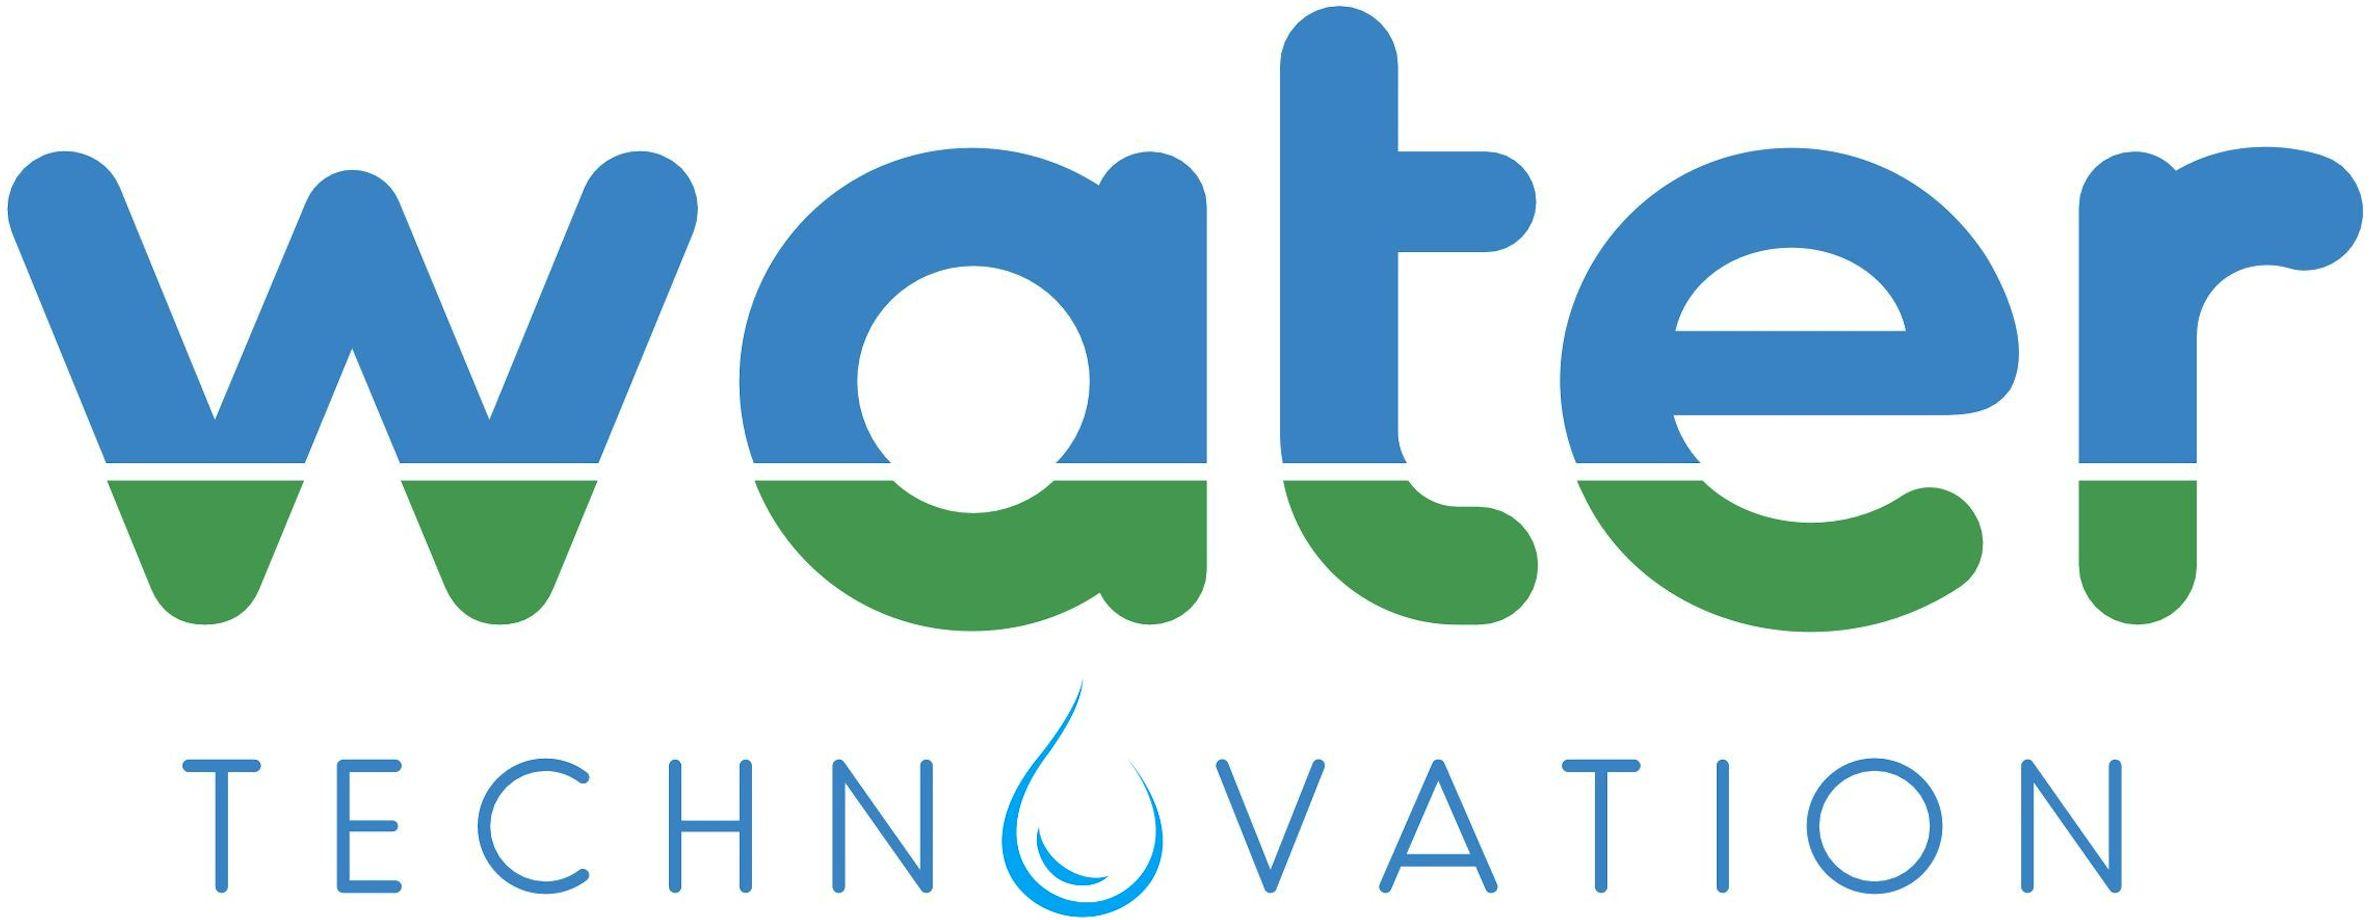 Water Technovation